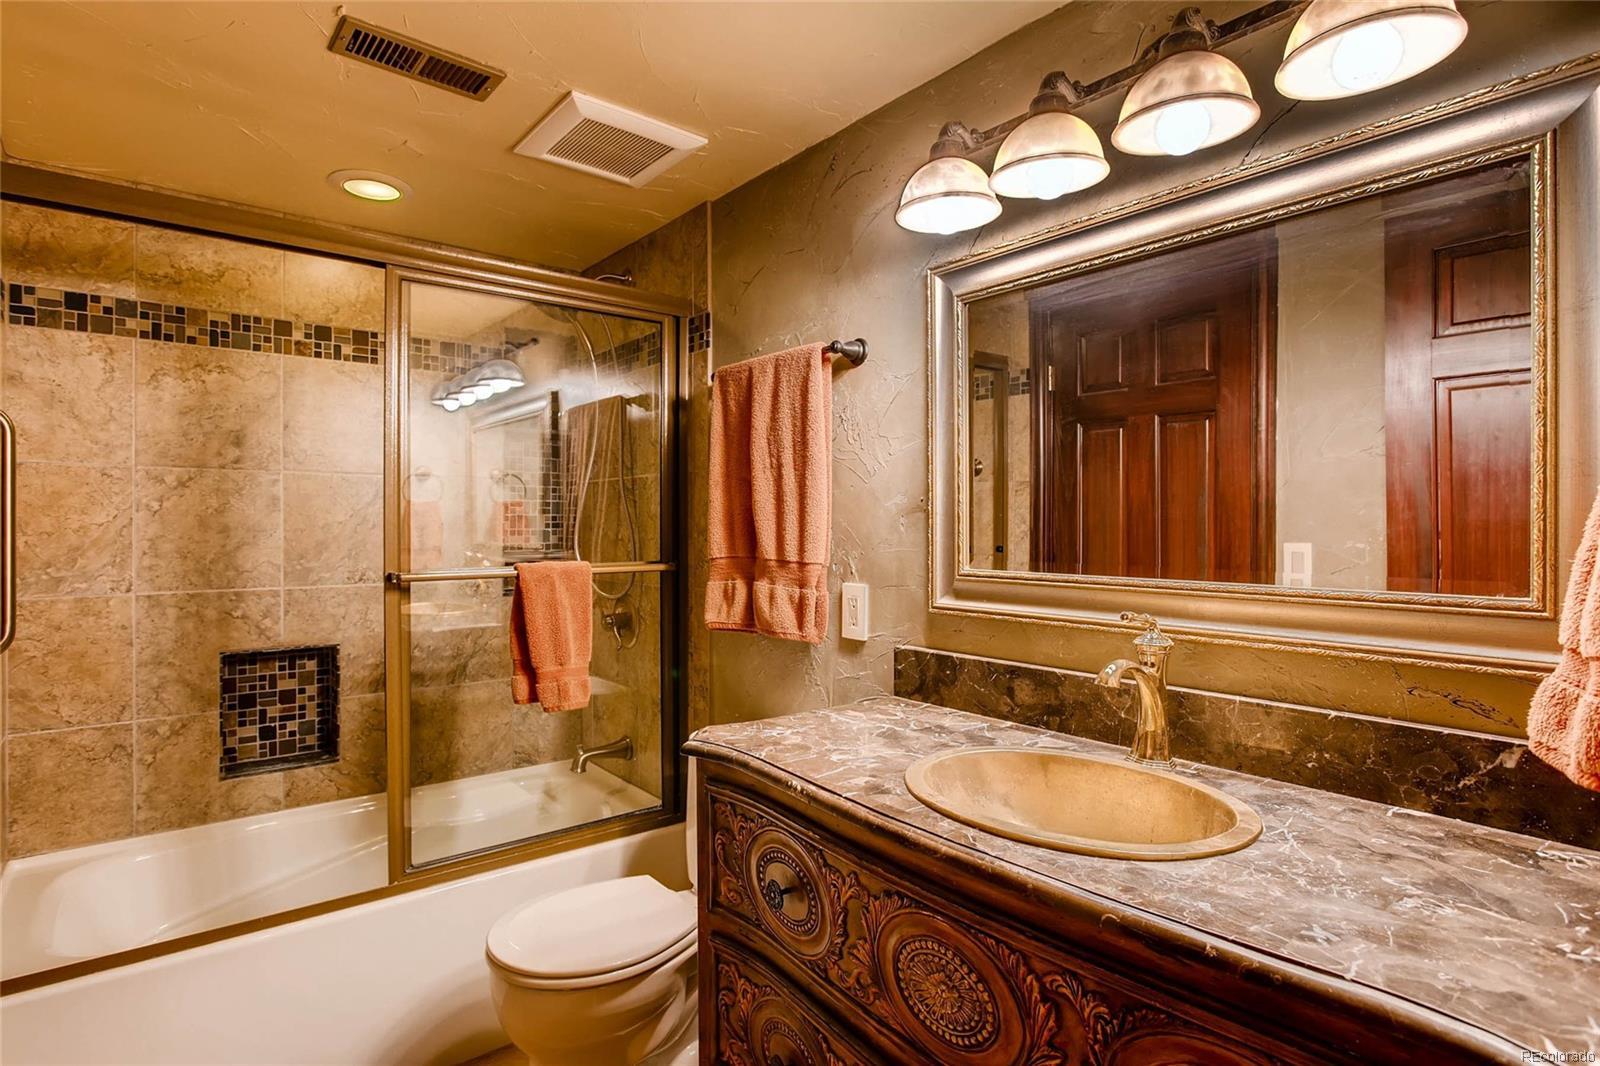 Full bathroom adjacent to bedroom in basement